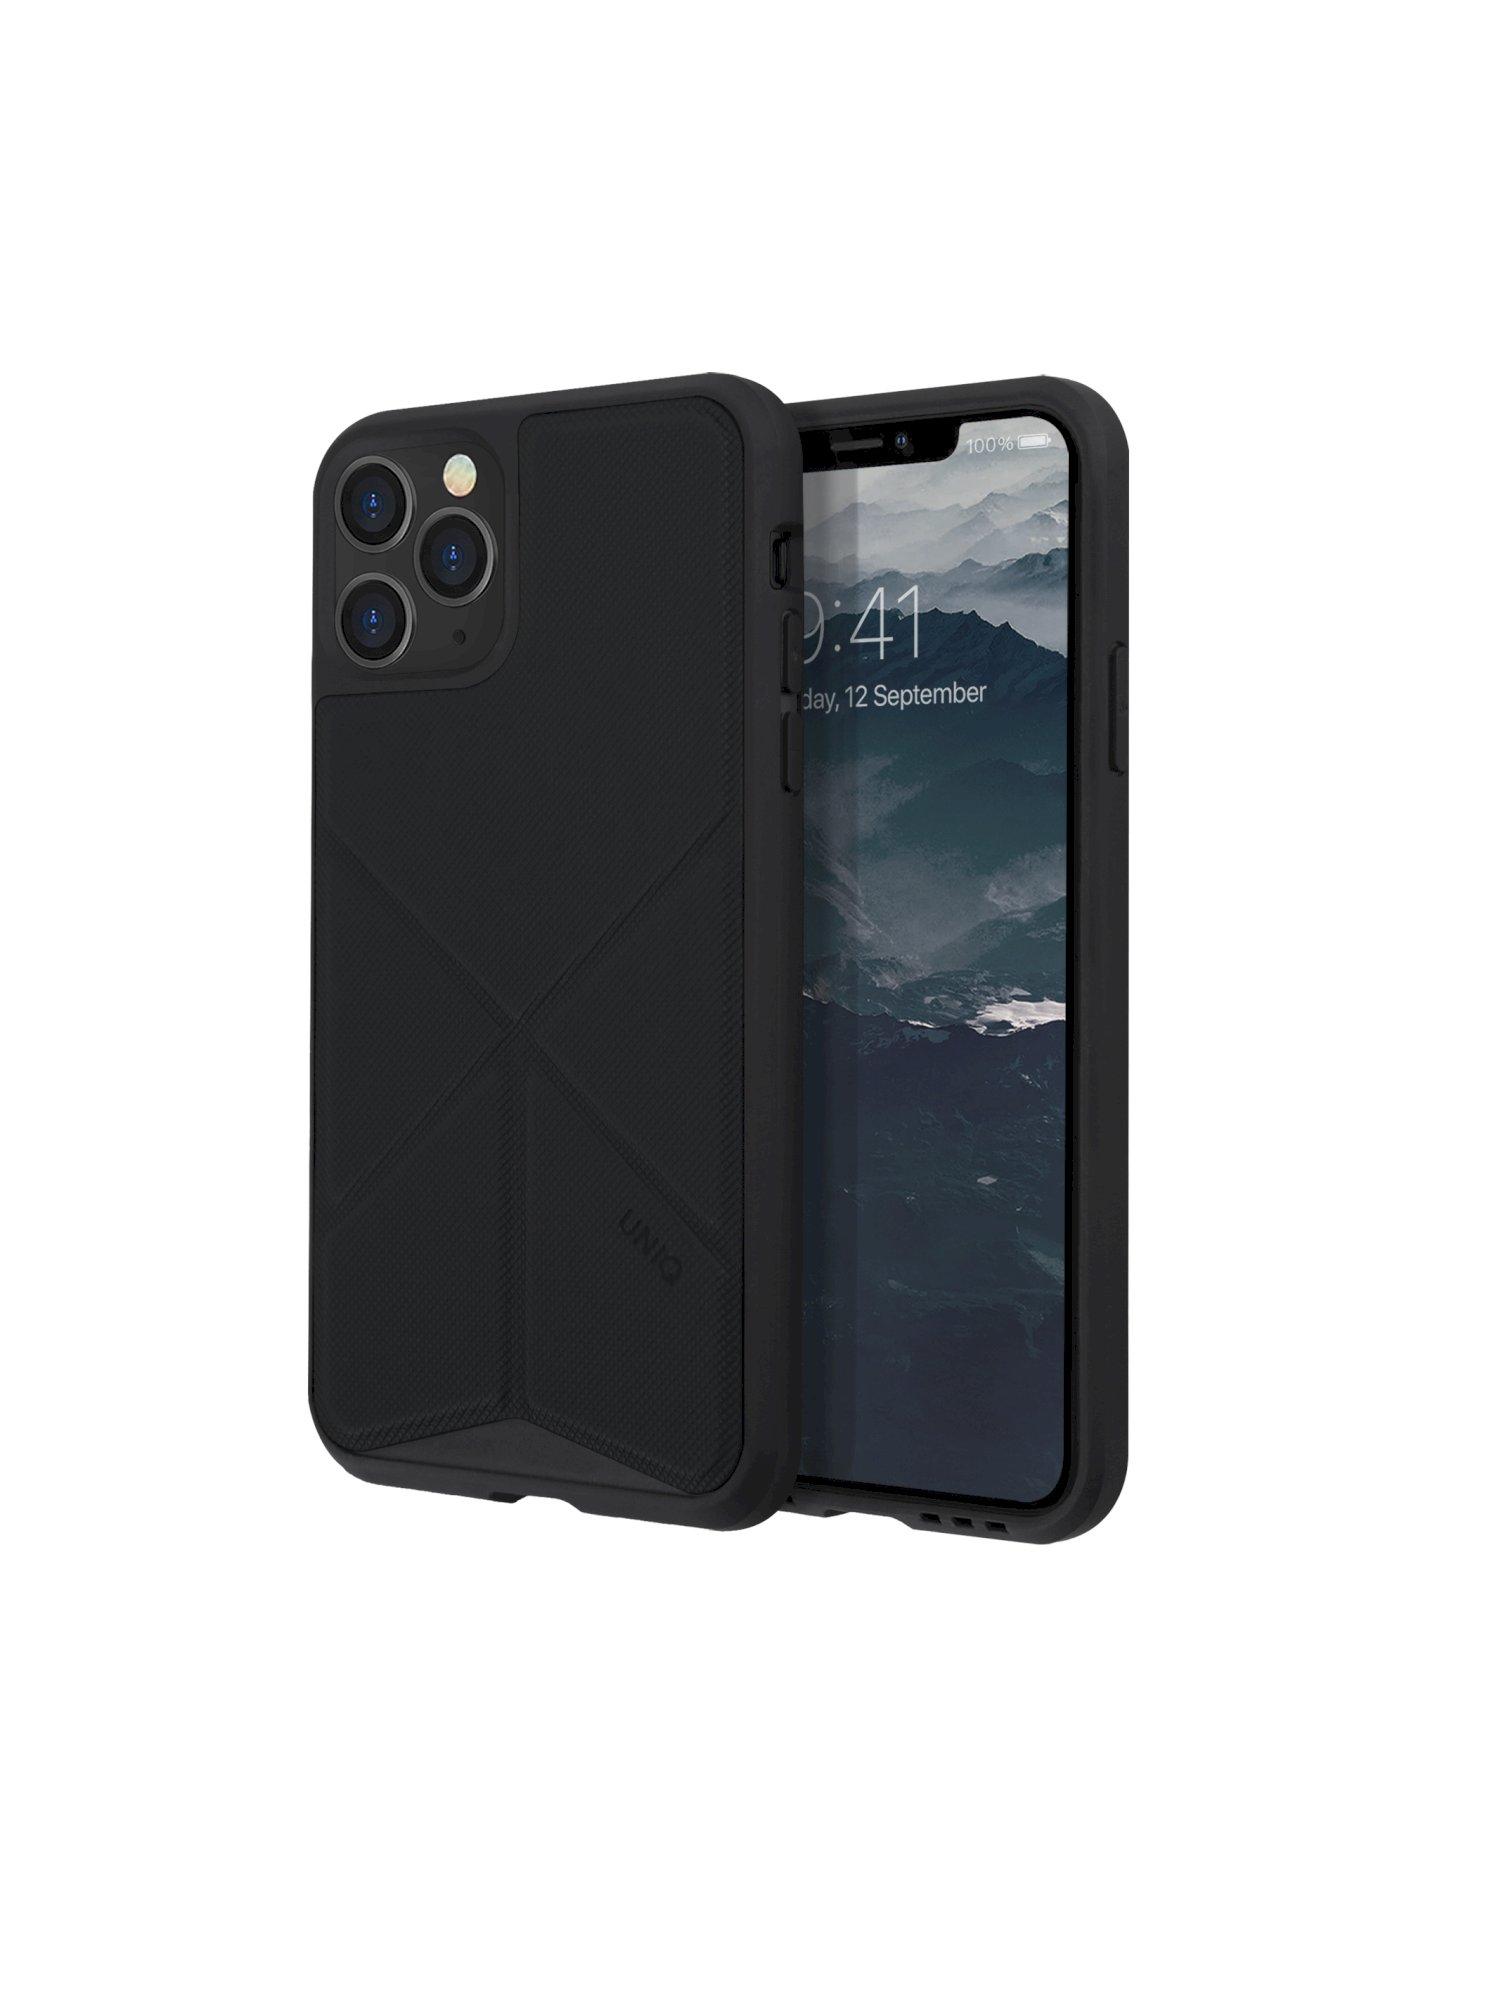 iPhone 11 Pro, case transforma, stand up ebony, black